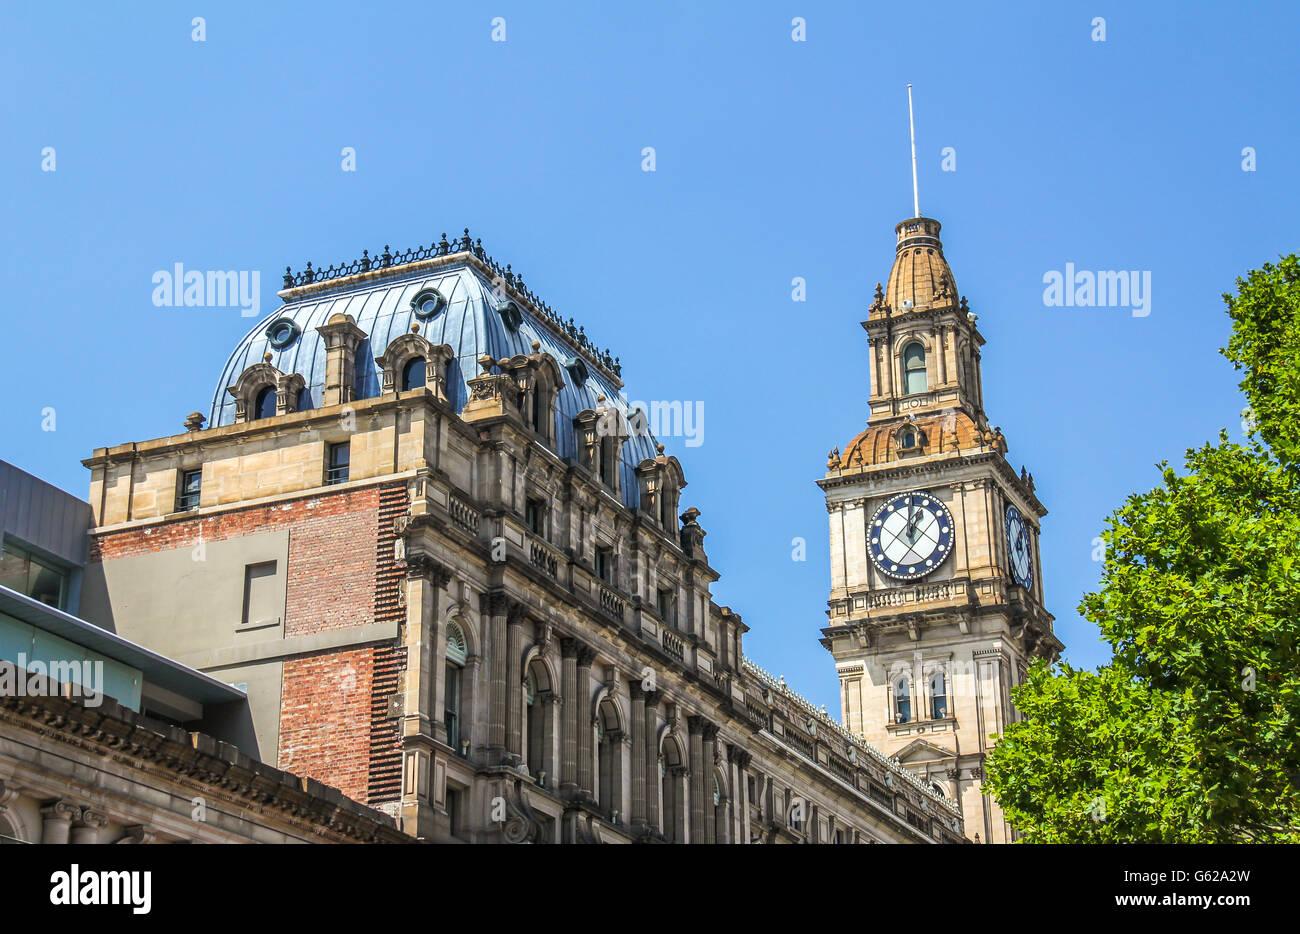 Clock tower in Melbourne Australia - Stock Image